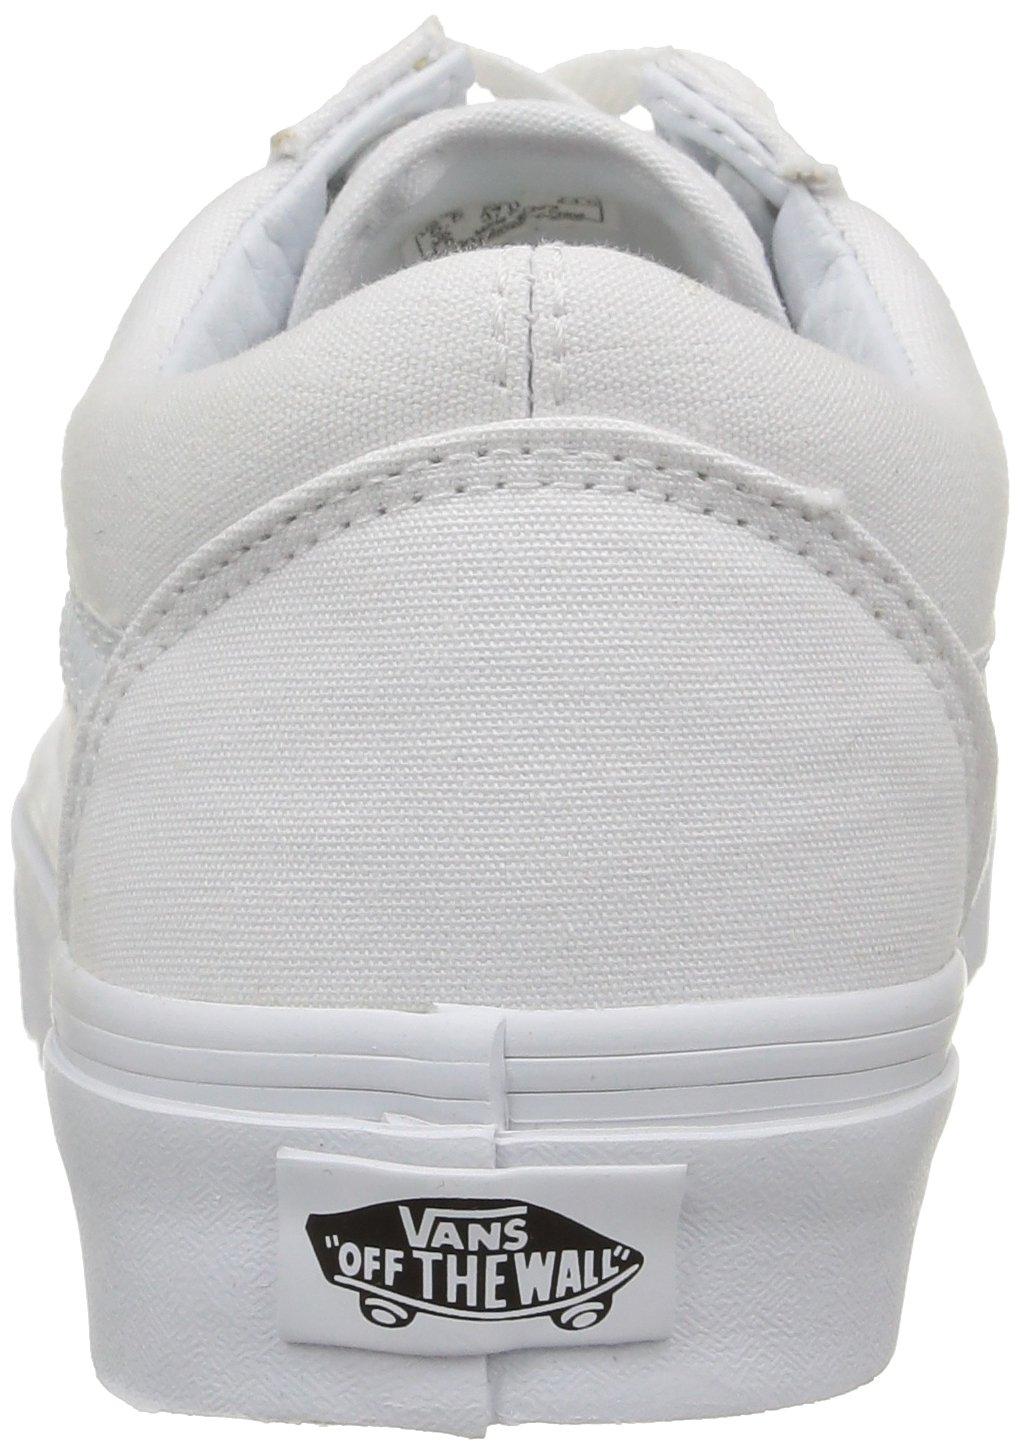 Vans Old Skool Unisex Adults' Low-Top Trainers B0020MMHCU Men's 8, Women's 9.5 Medium|True White